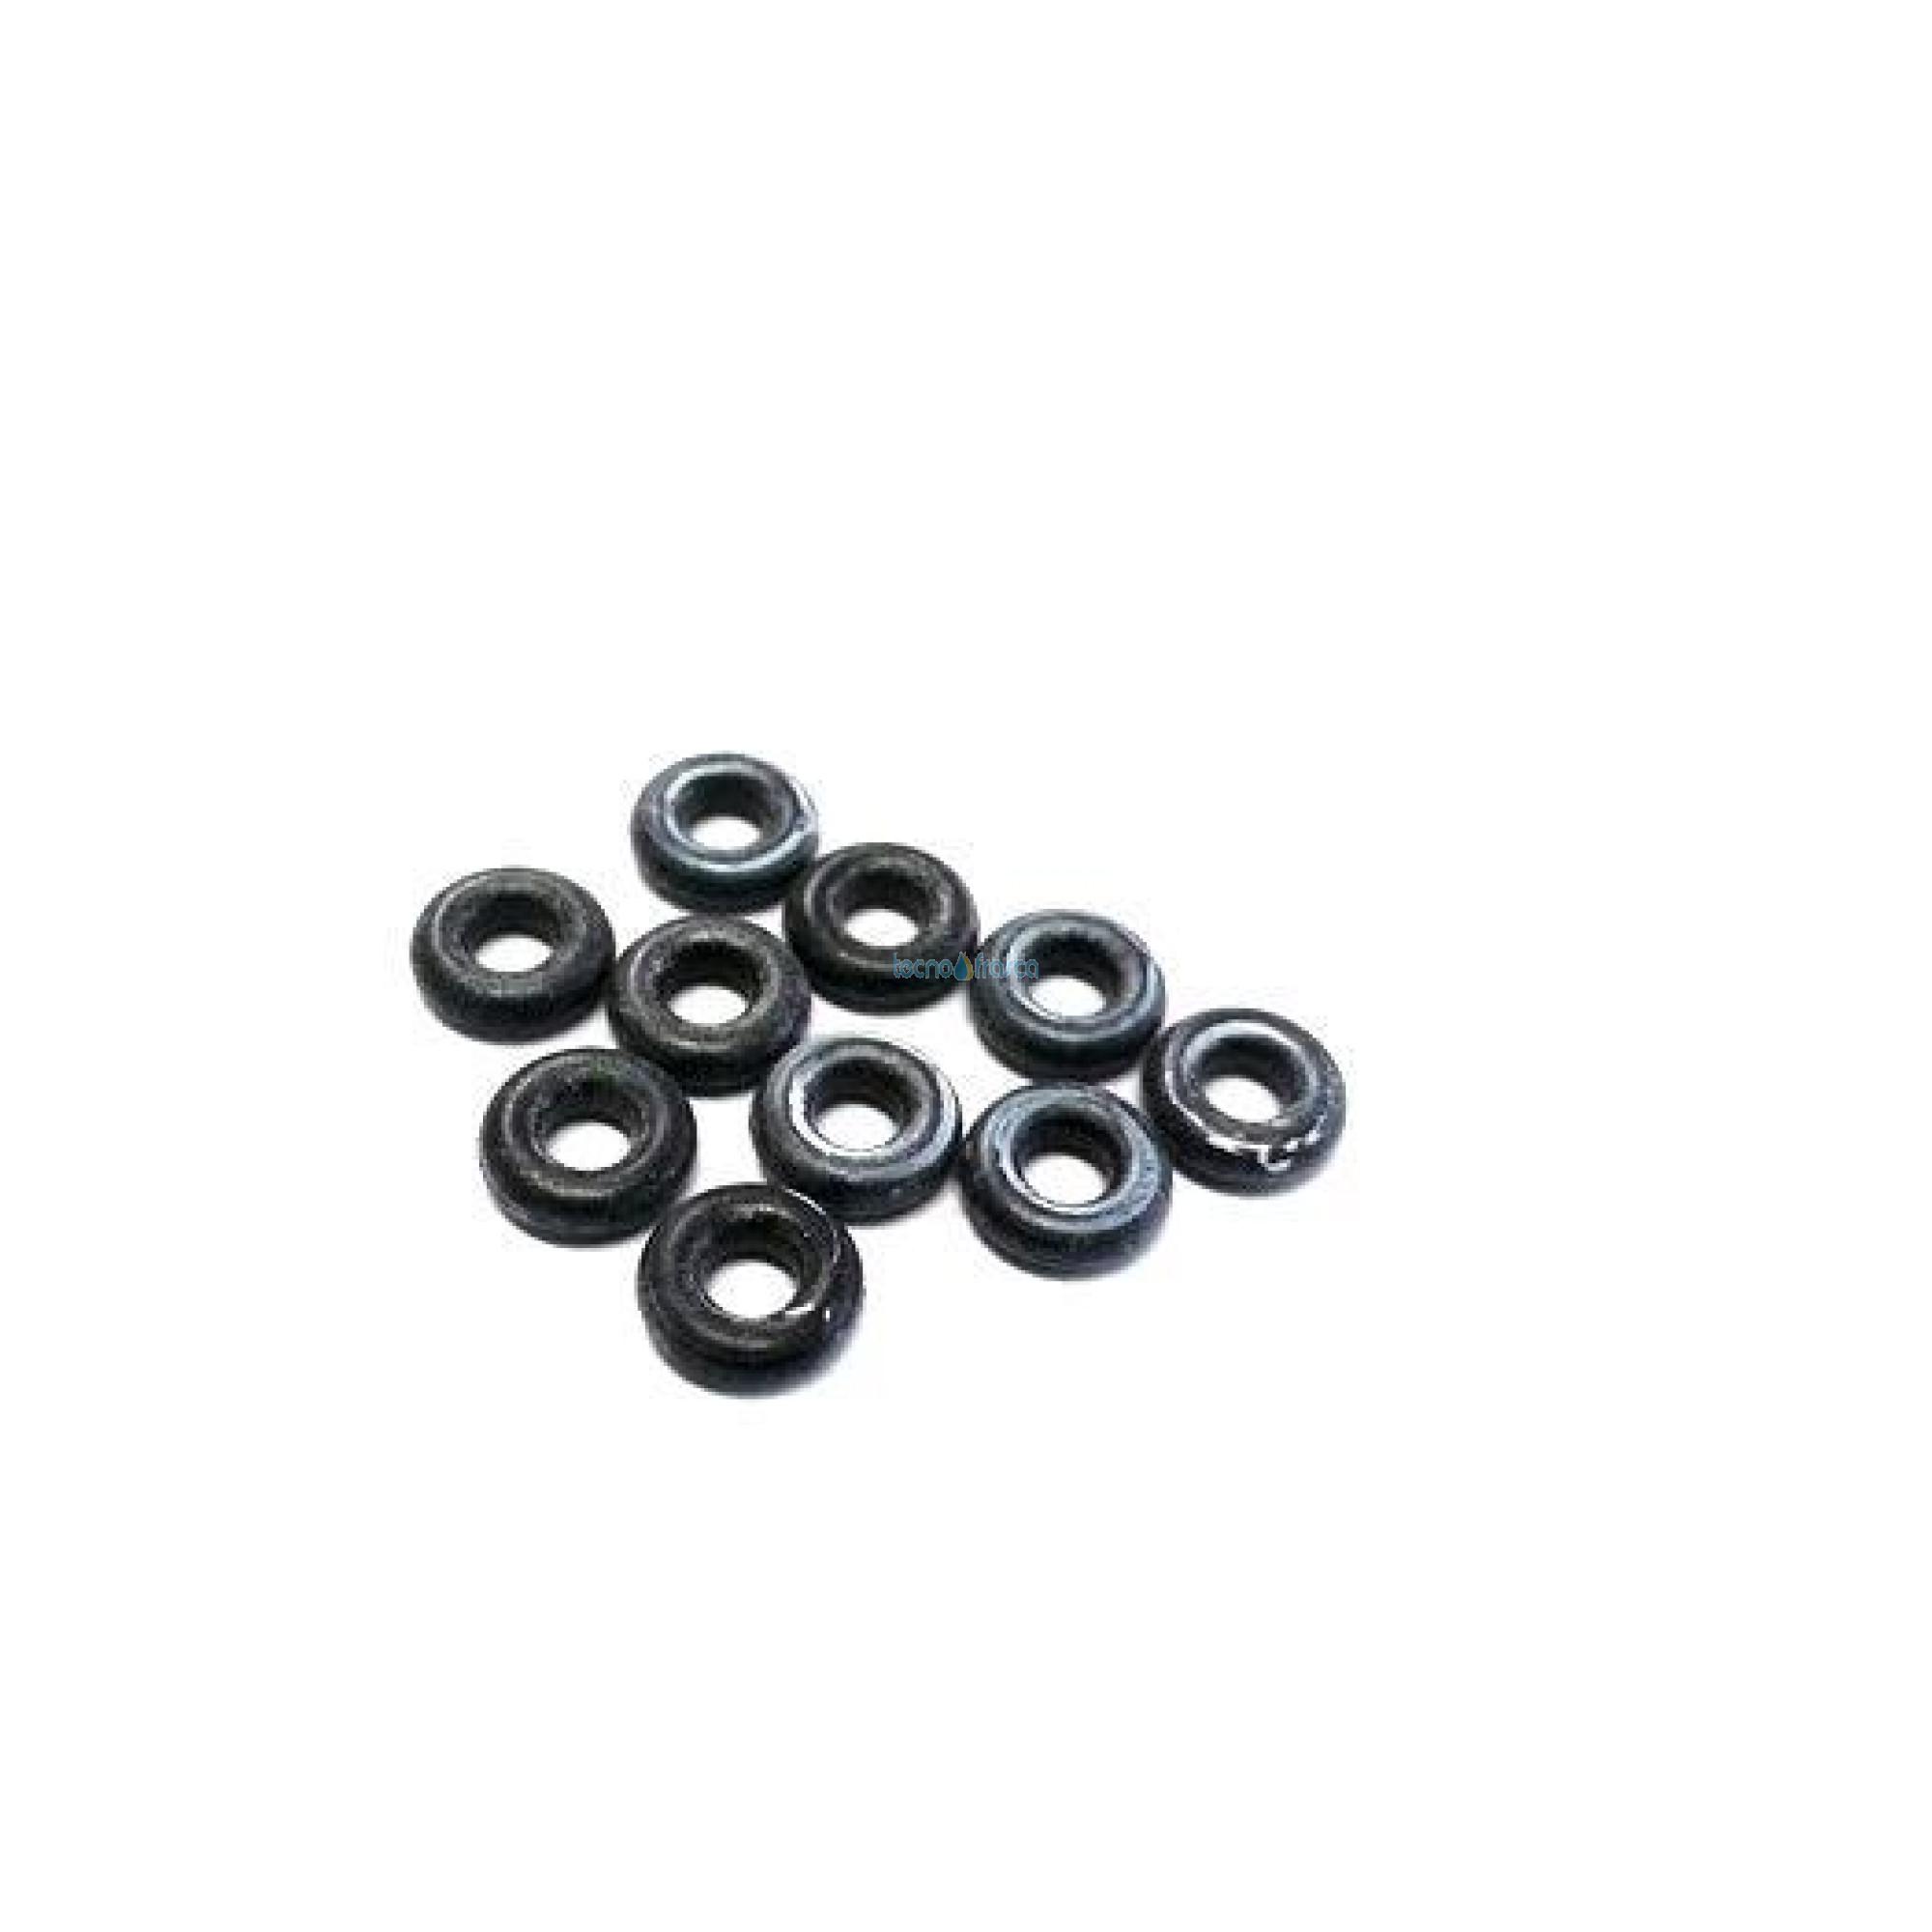 Baxi anello or 2,6x1,9 10 pezzi jjj005405400